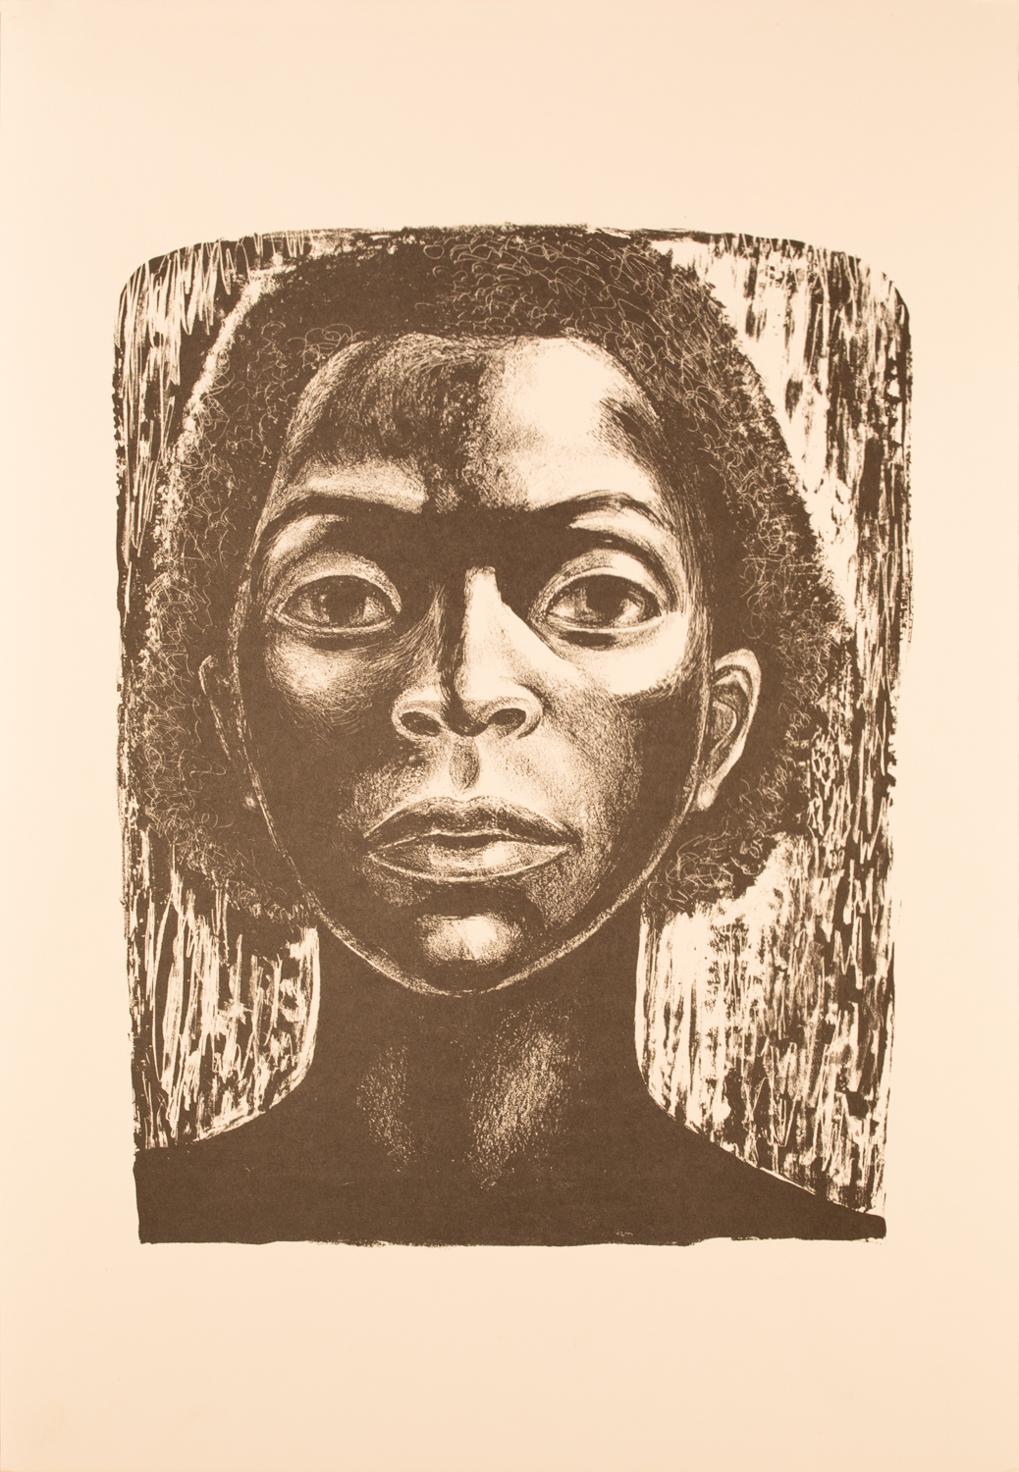 Catlett - The Black Woman Speaks